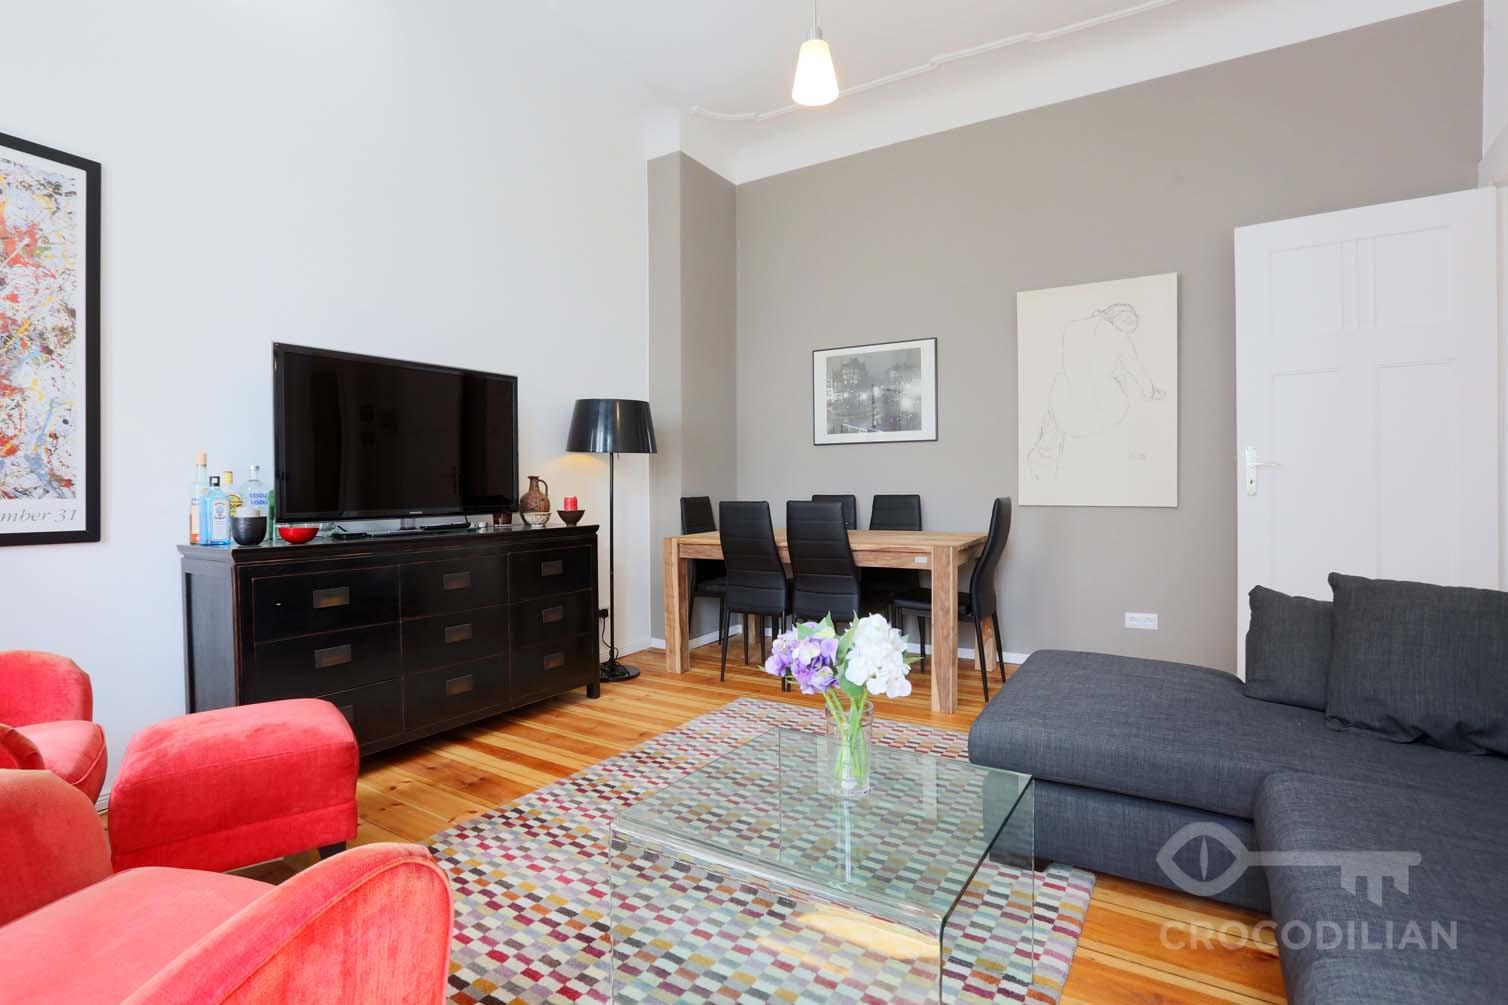 Stylish 2-Room Apartment with Flair, Eisenacher Str.